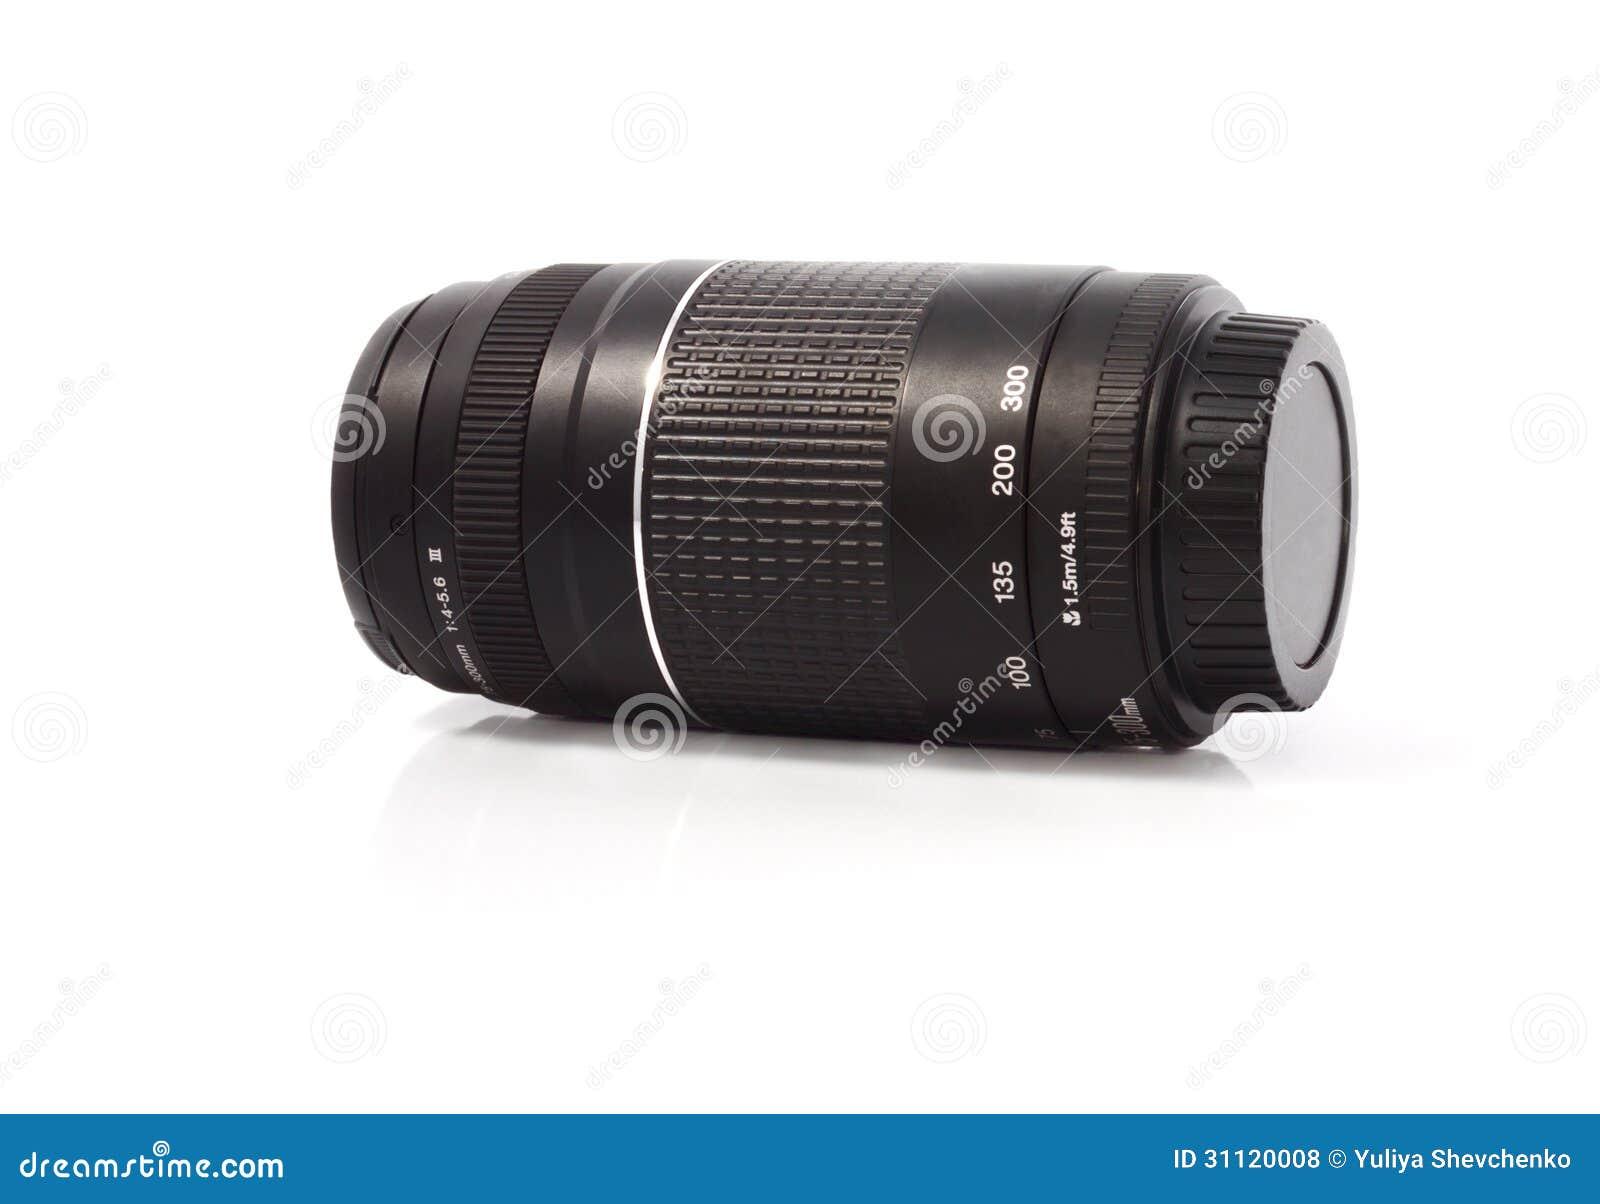 how to change dslr lens